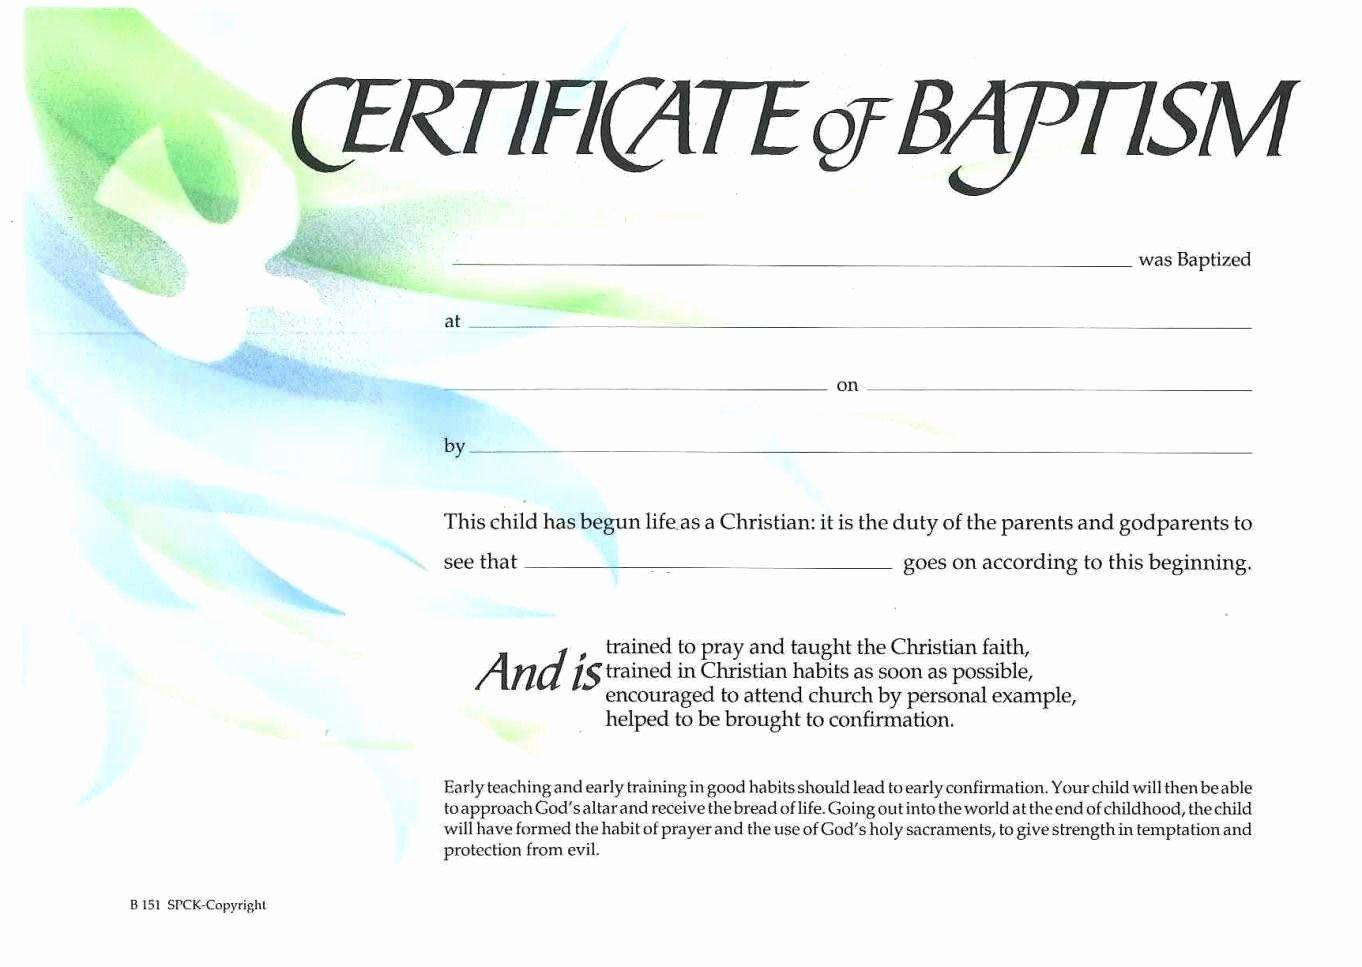 Catholic Baptism Certificate Template New Sample Baptism Certificate Templates